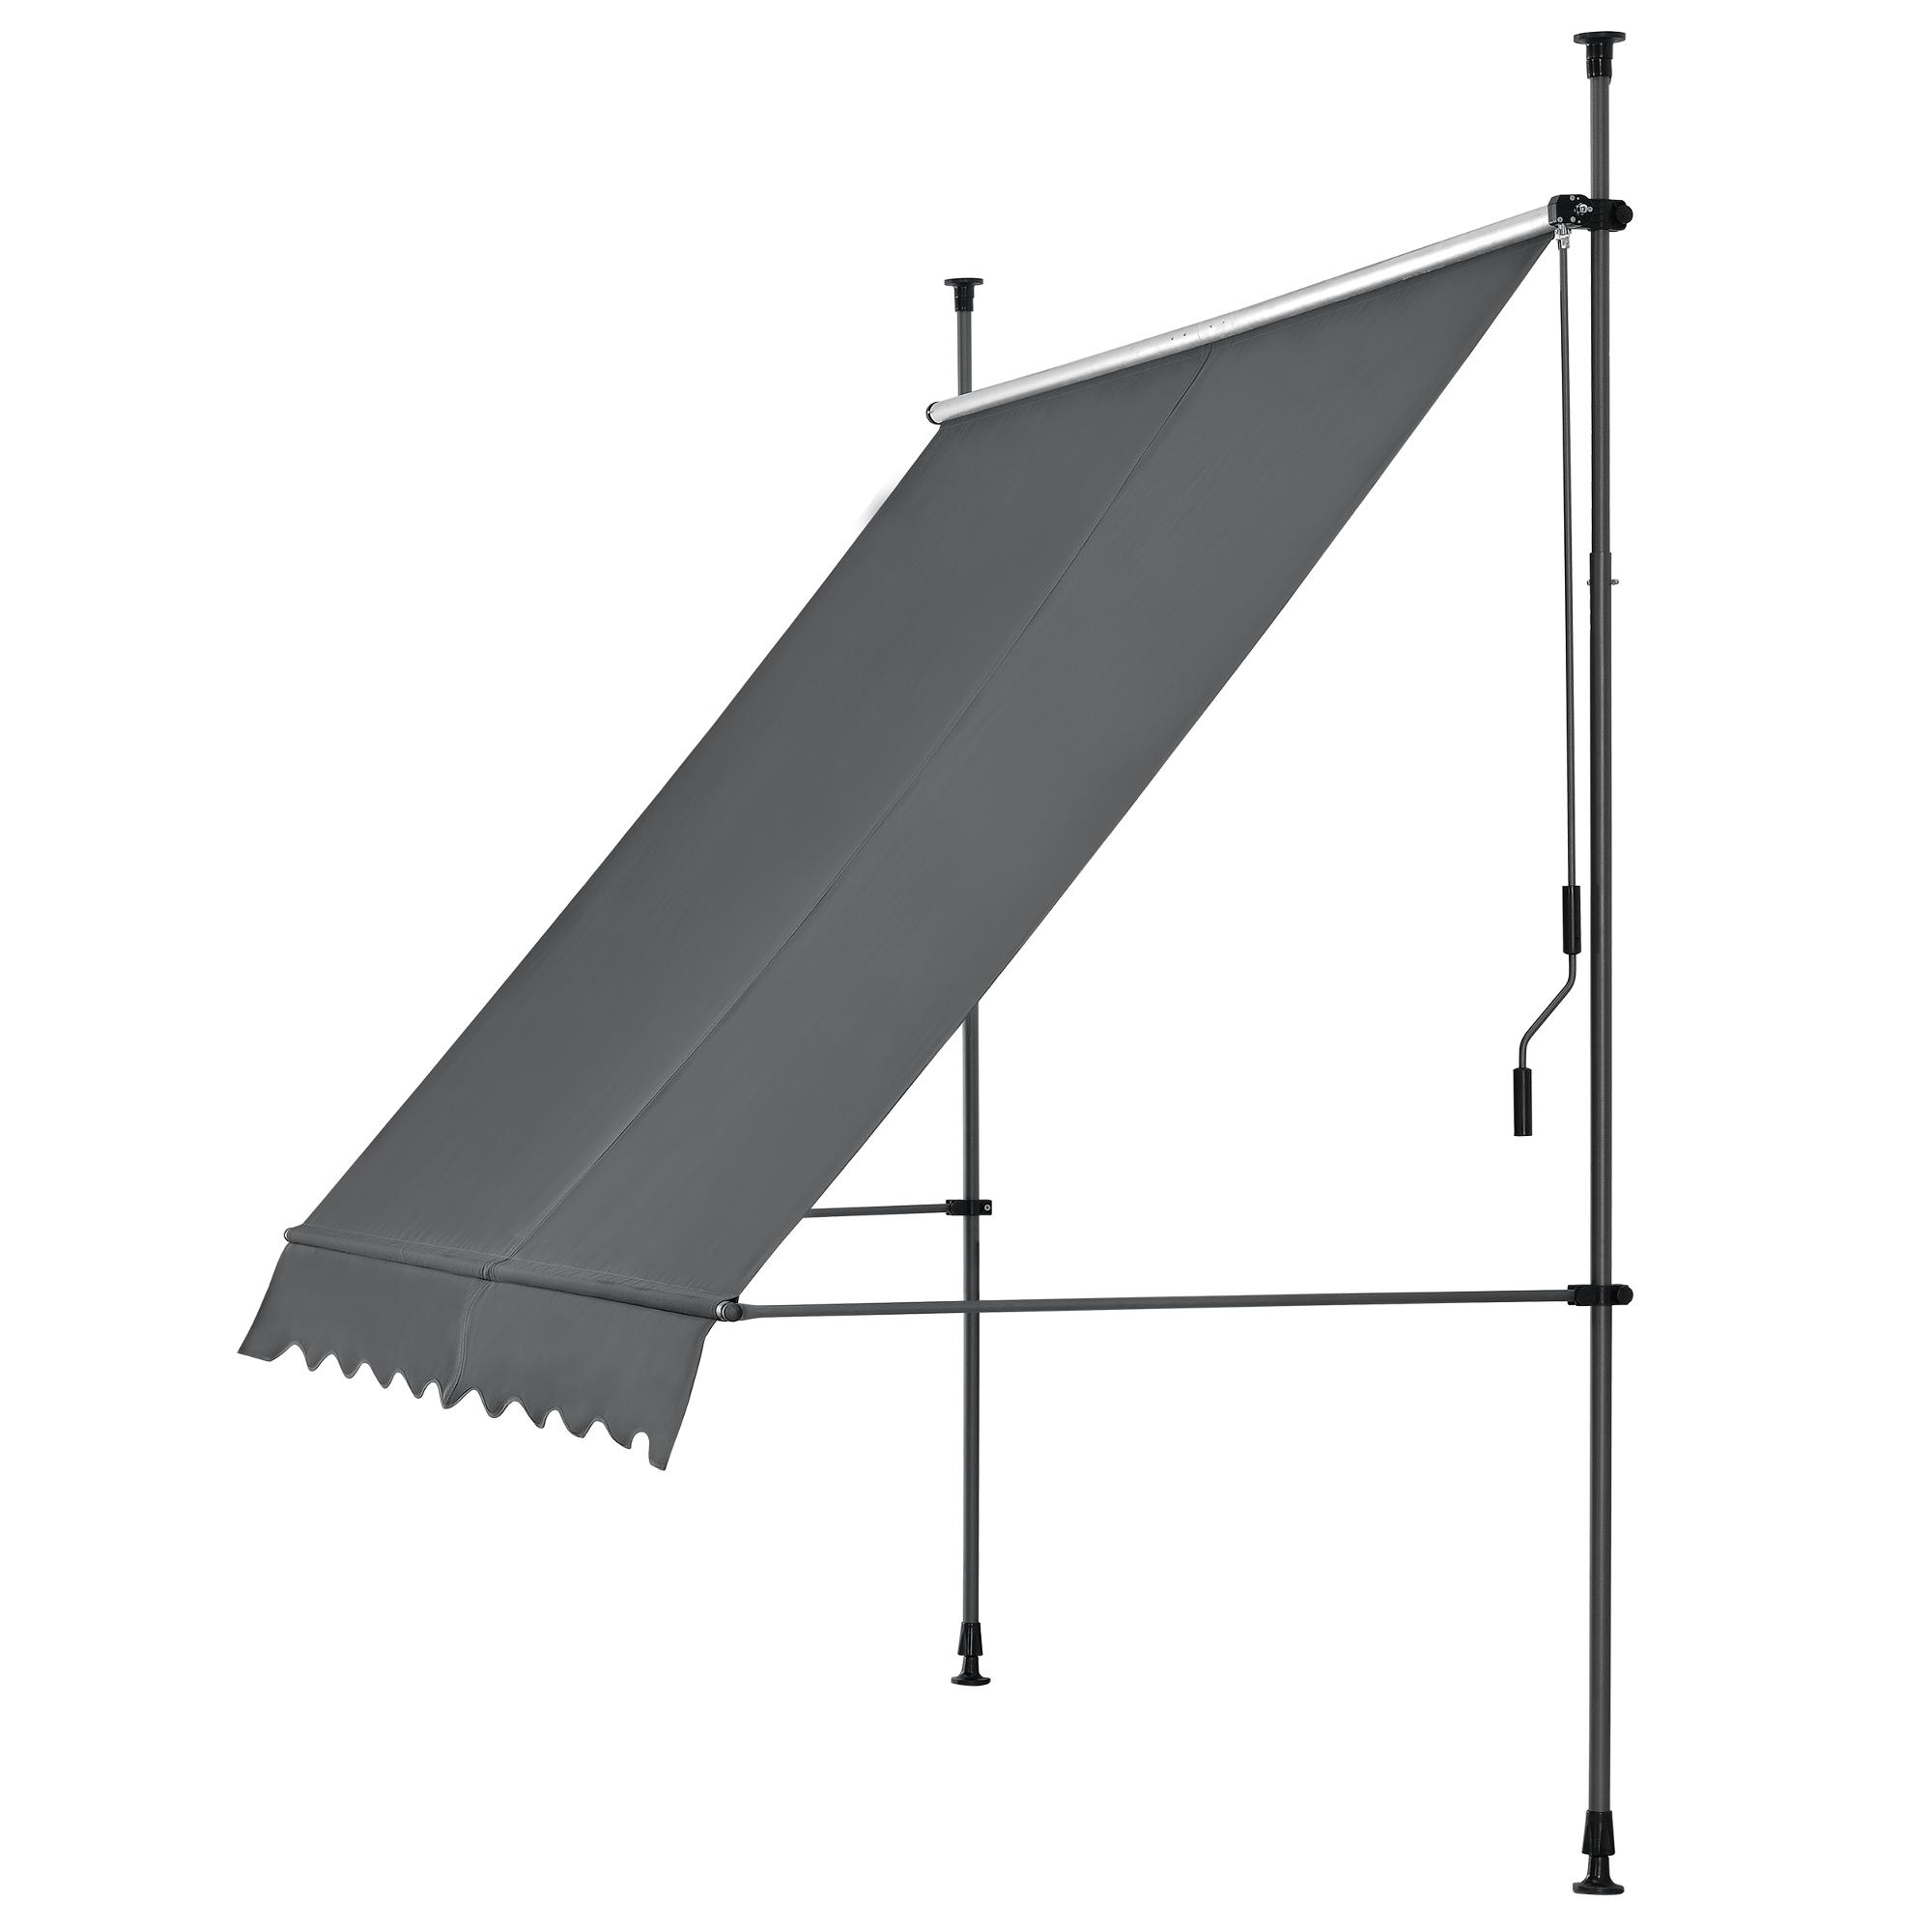 pro tec pince marquise 200 300 cm auvent balcon store protection soleil sans percer ebay. Black Bedroom Furniture Sets. Home Design Ideas